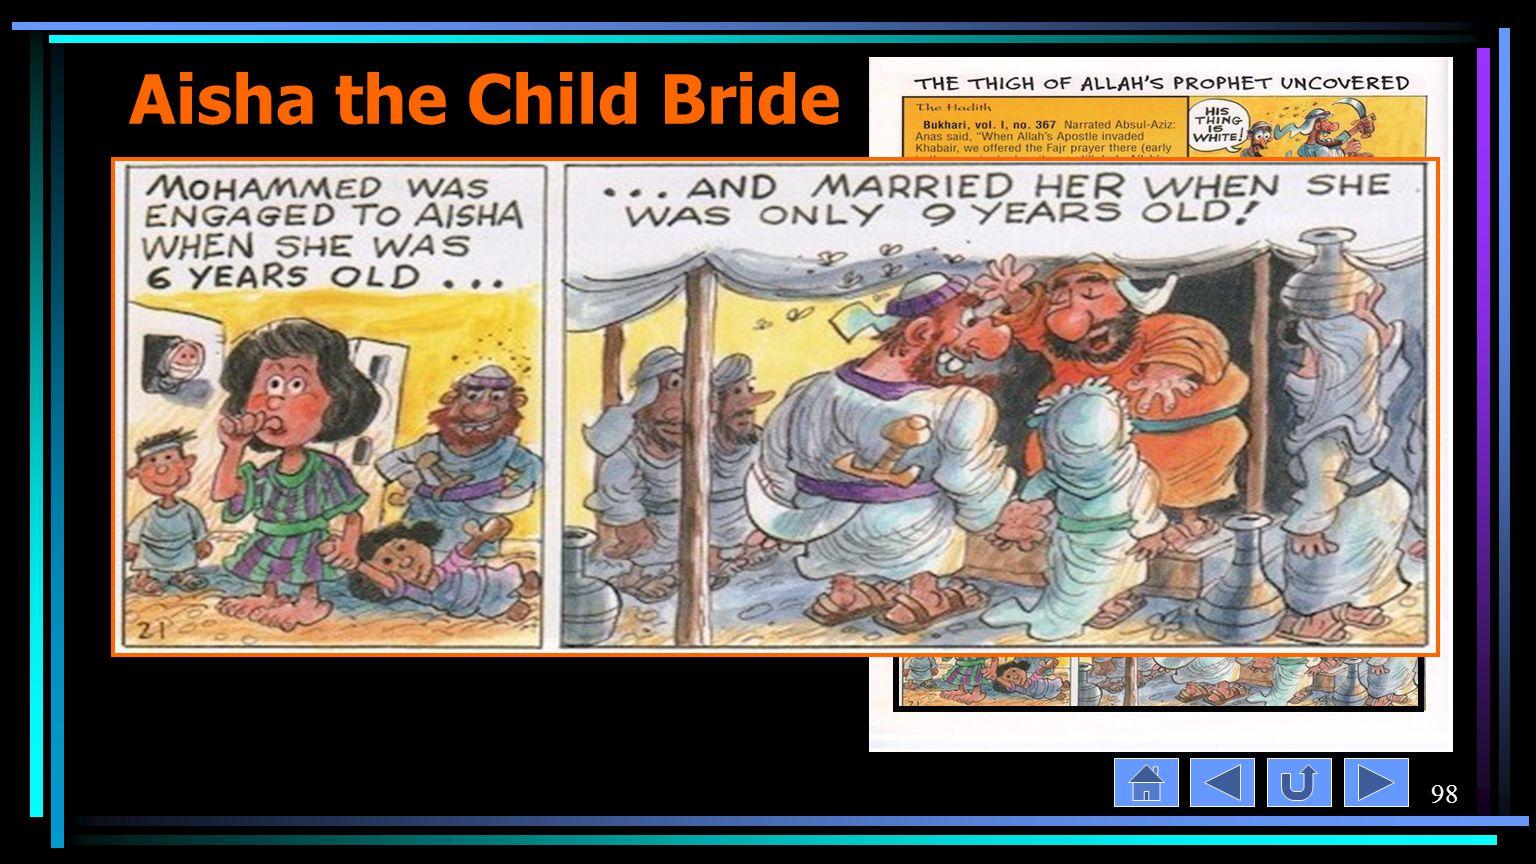 98 Aisha the Child Bride